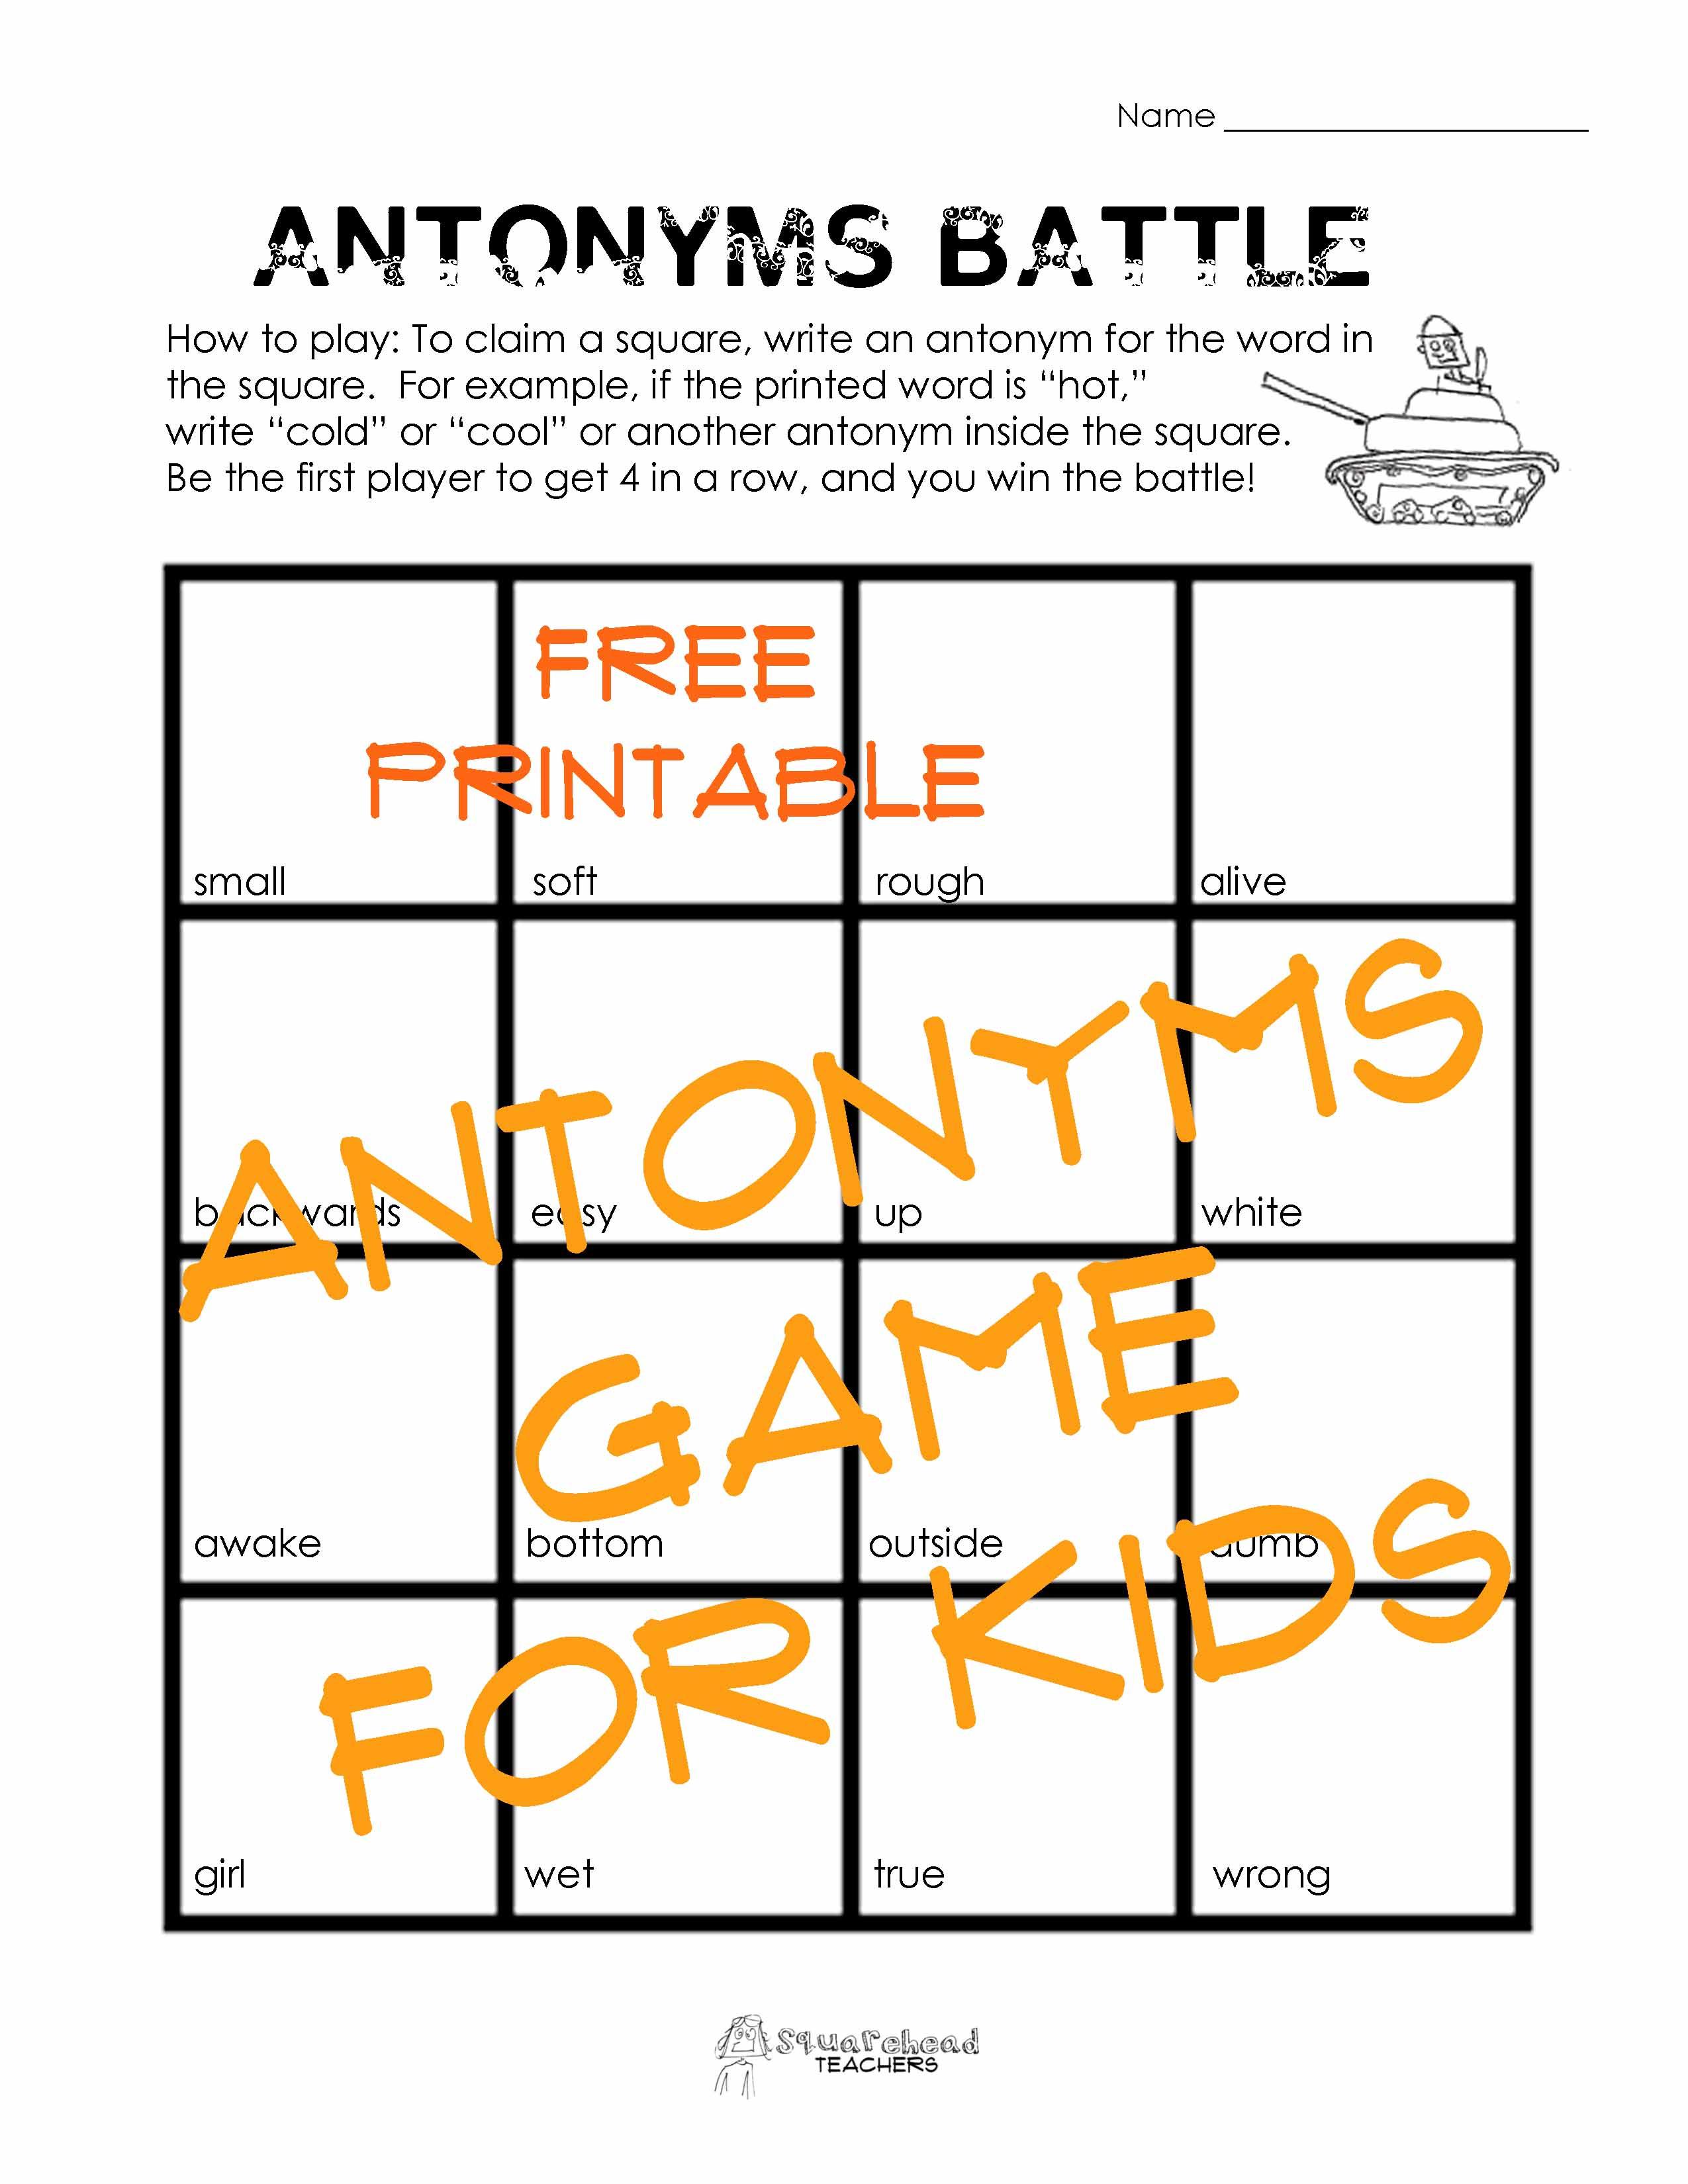 Antonyms Game For Kids